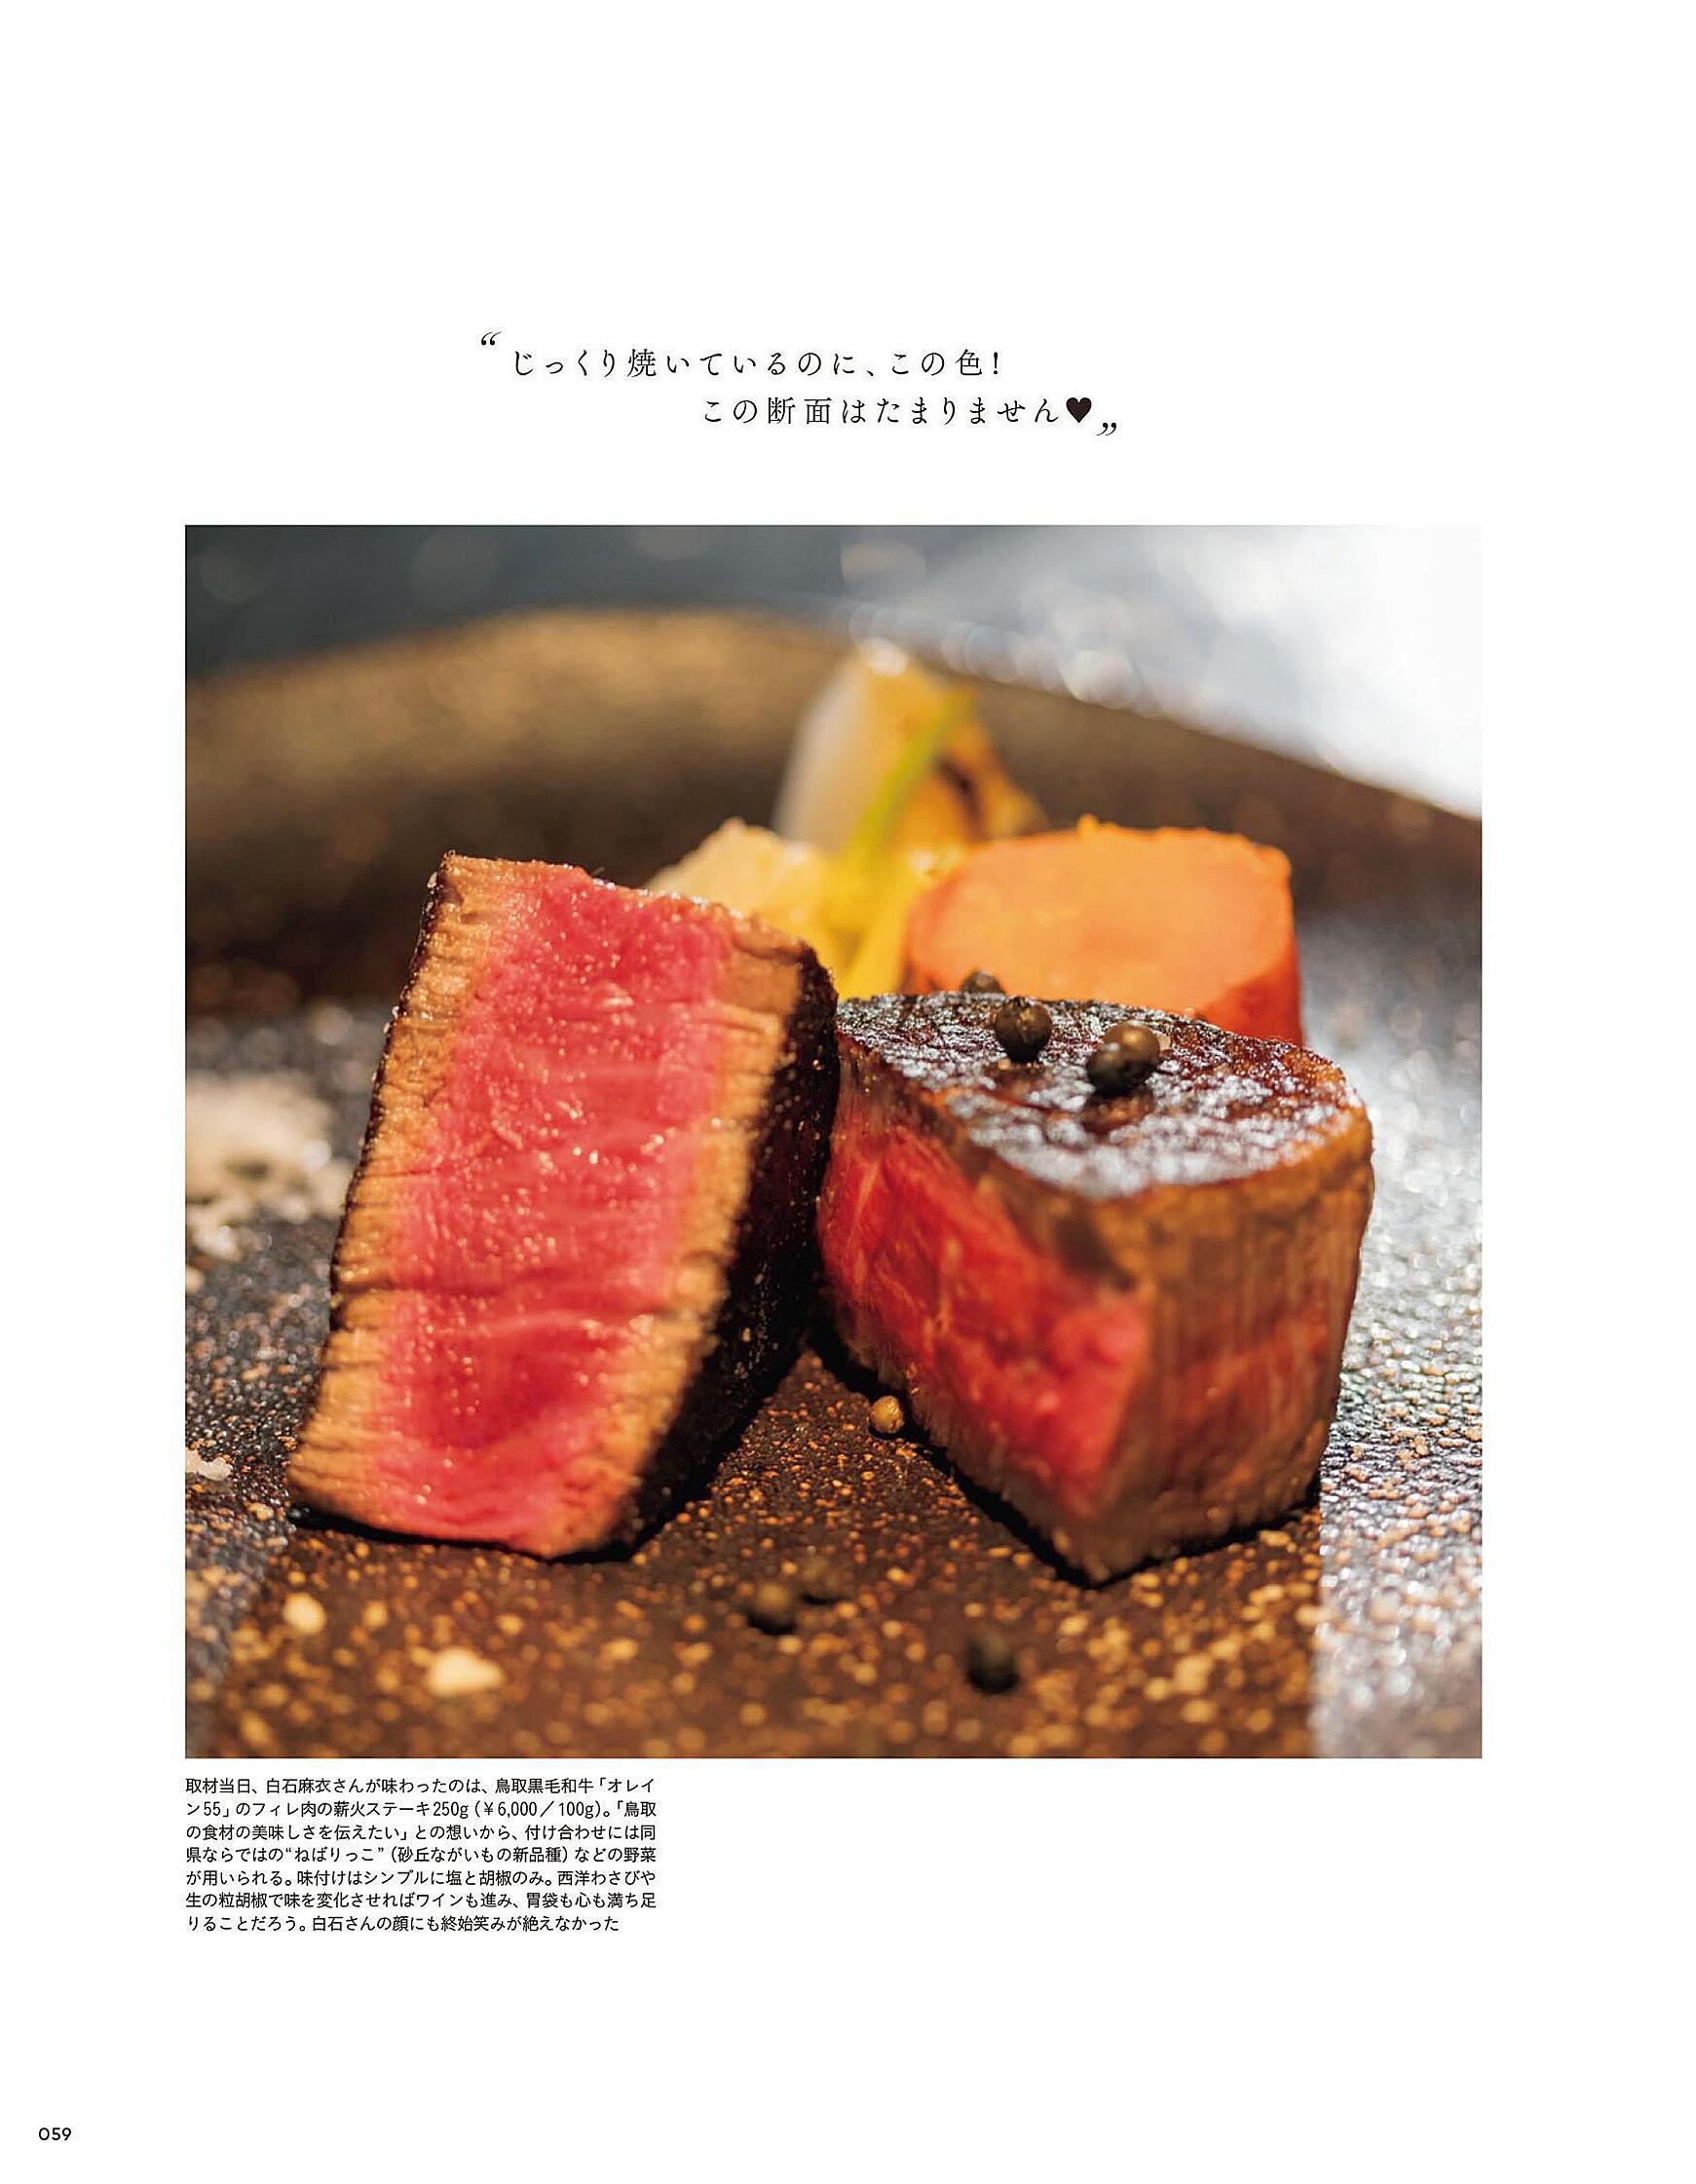 MShiraishi Tokyo Calendar 2020-04 06.jpg